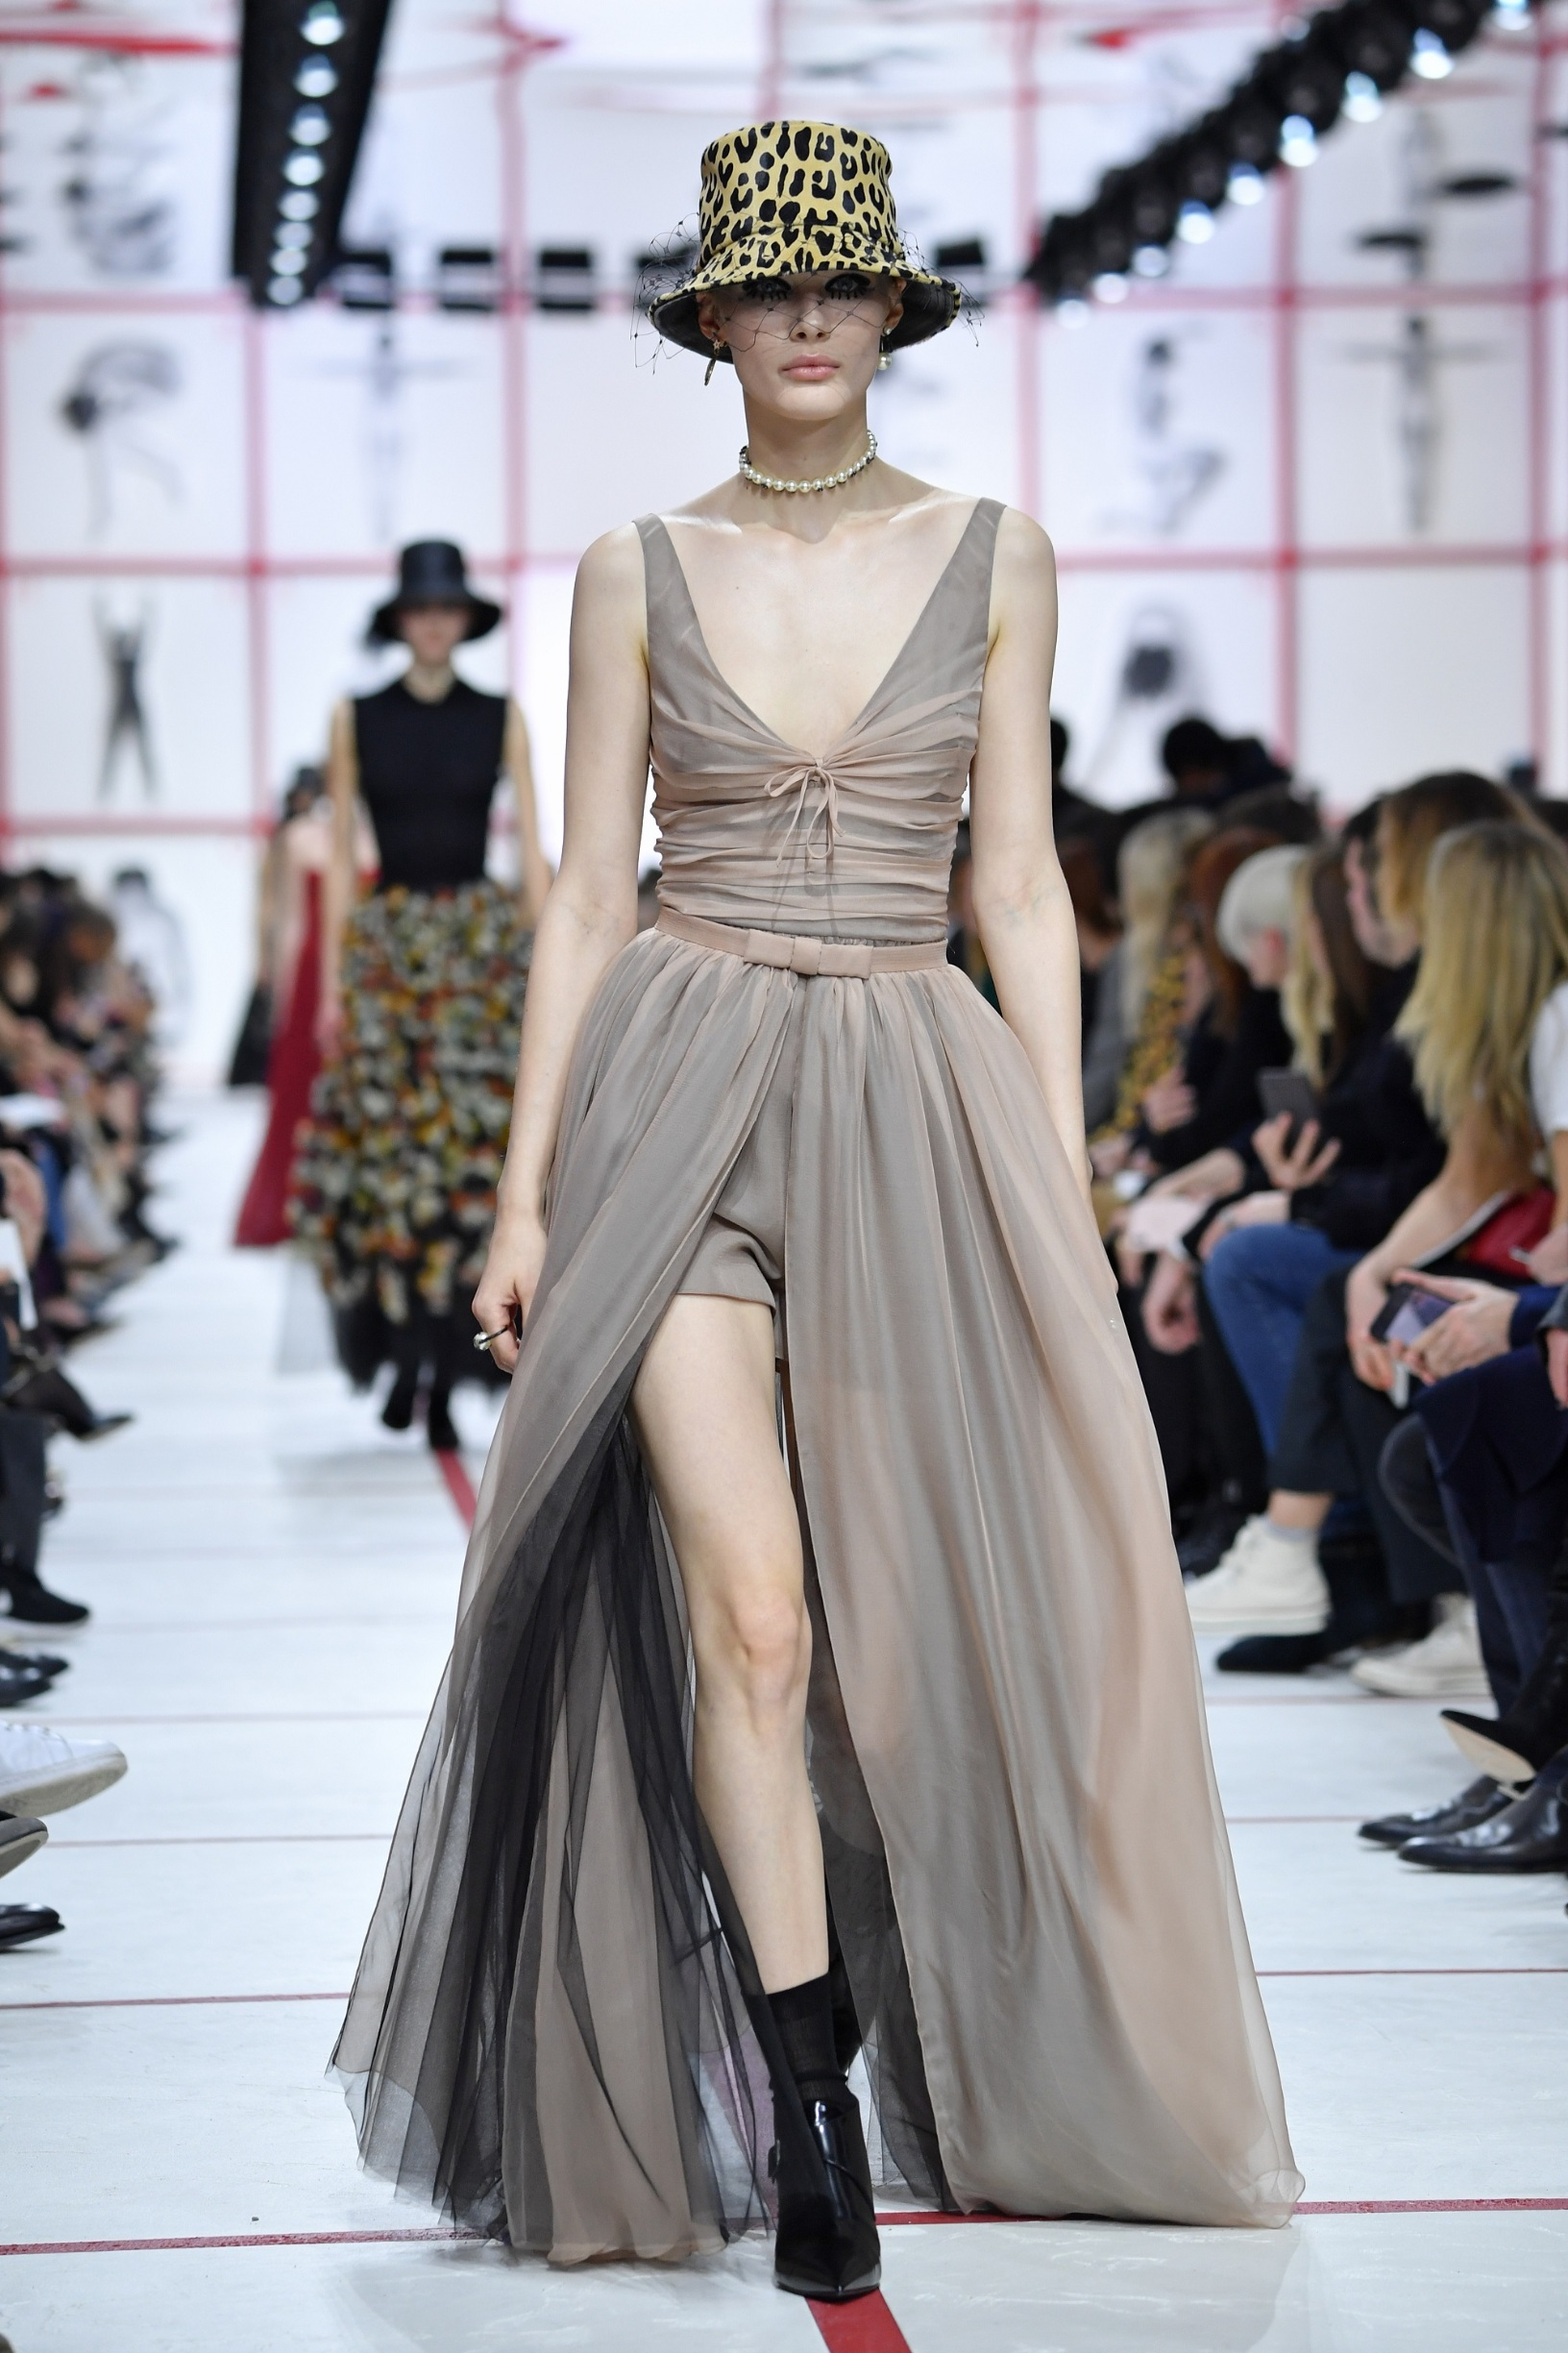 Dior Runway 2019/2020